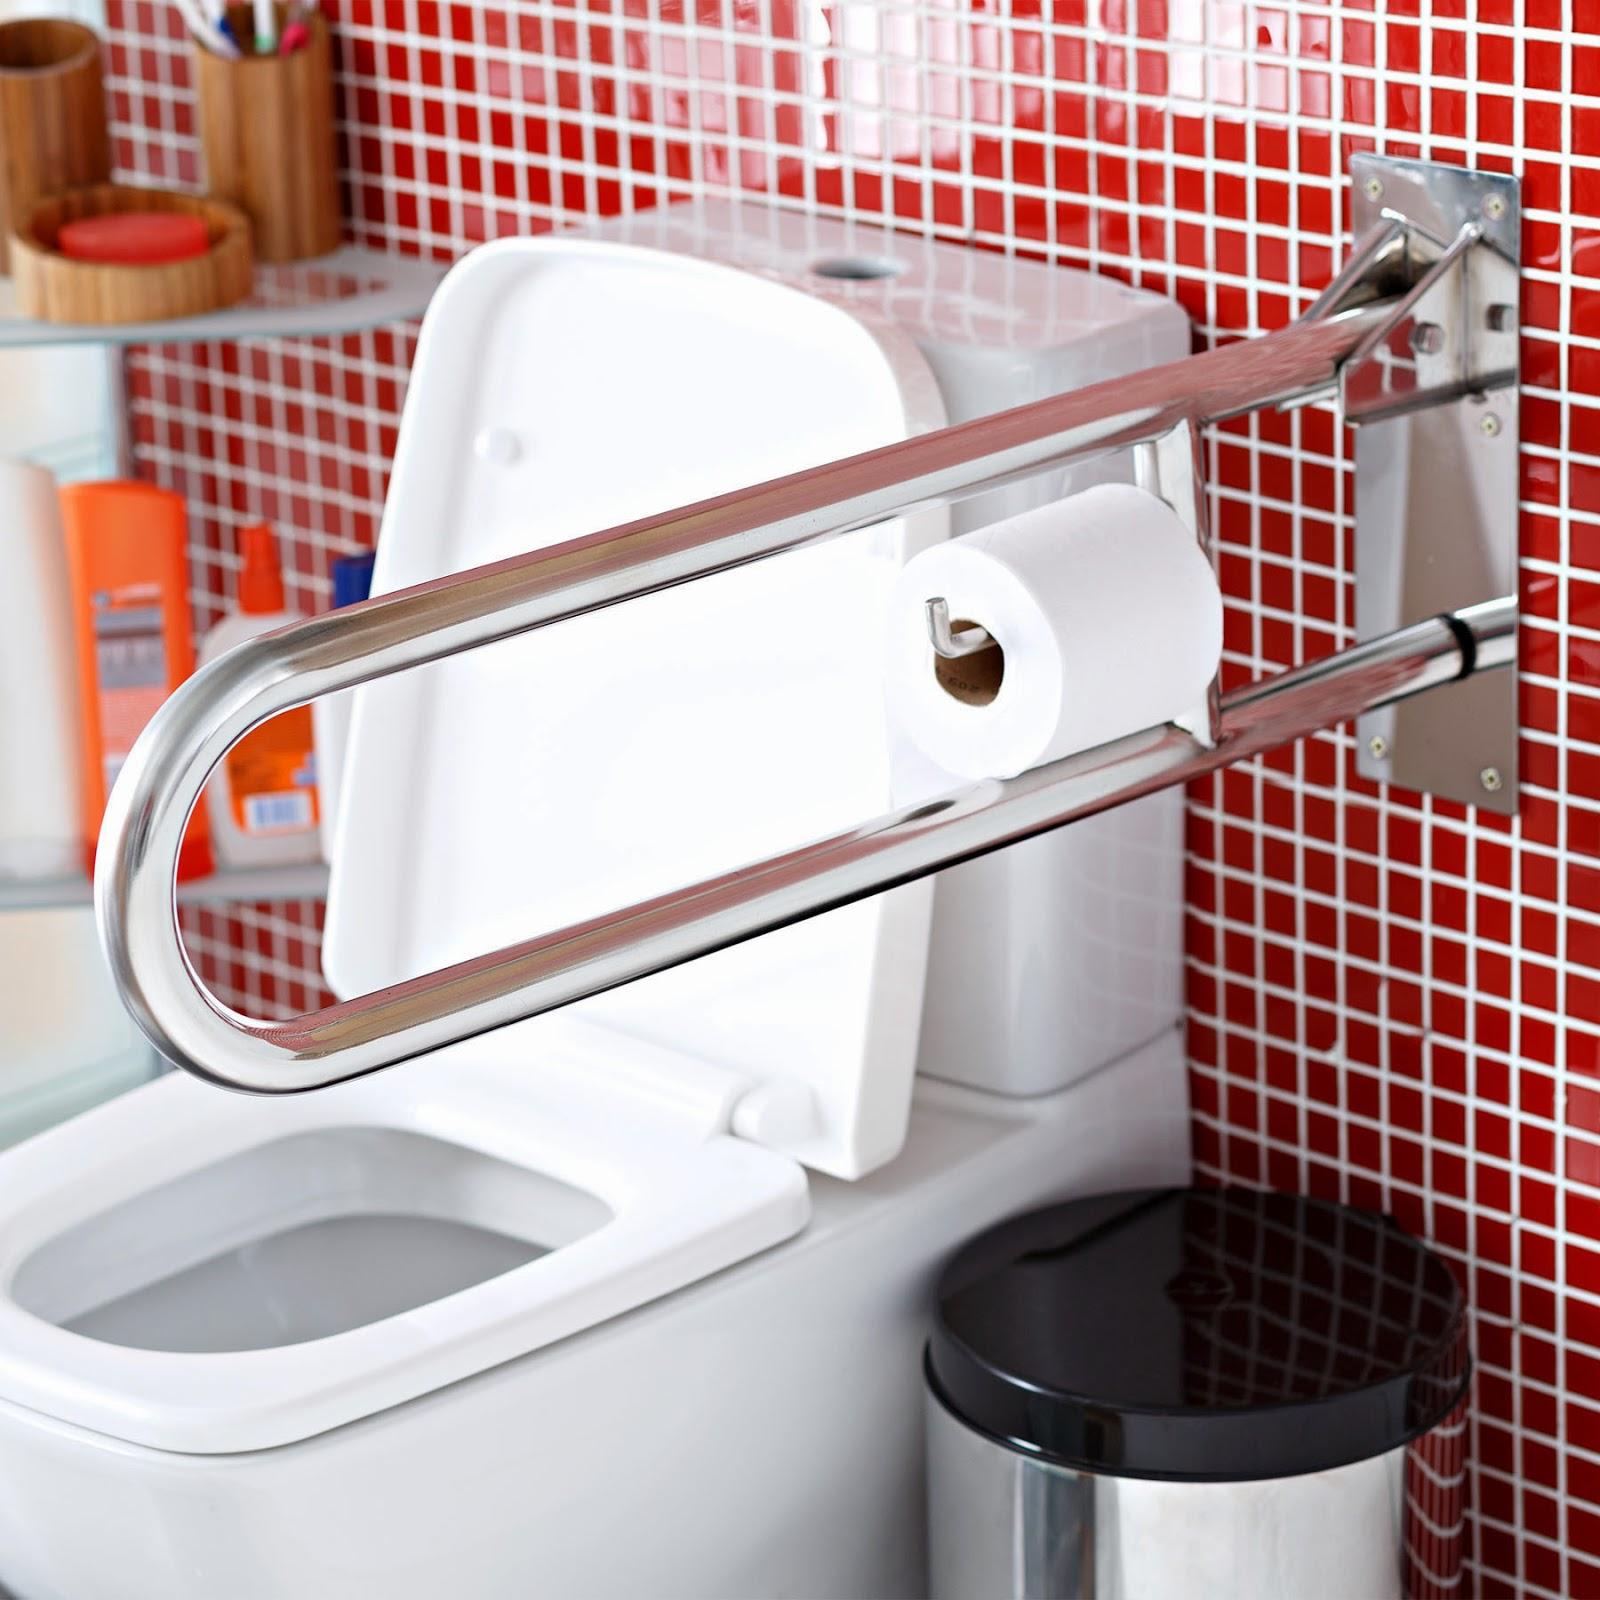 Kausben: Segurança doméstica para deficientes e idosos. #B32418 1600 1600